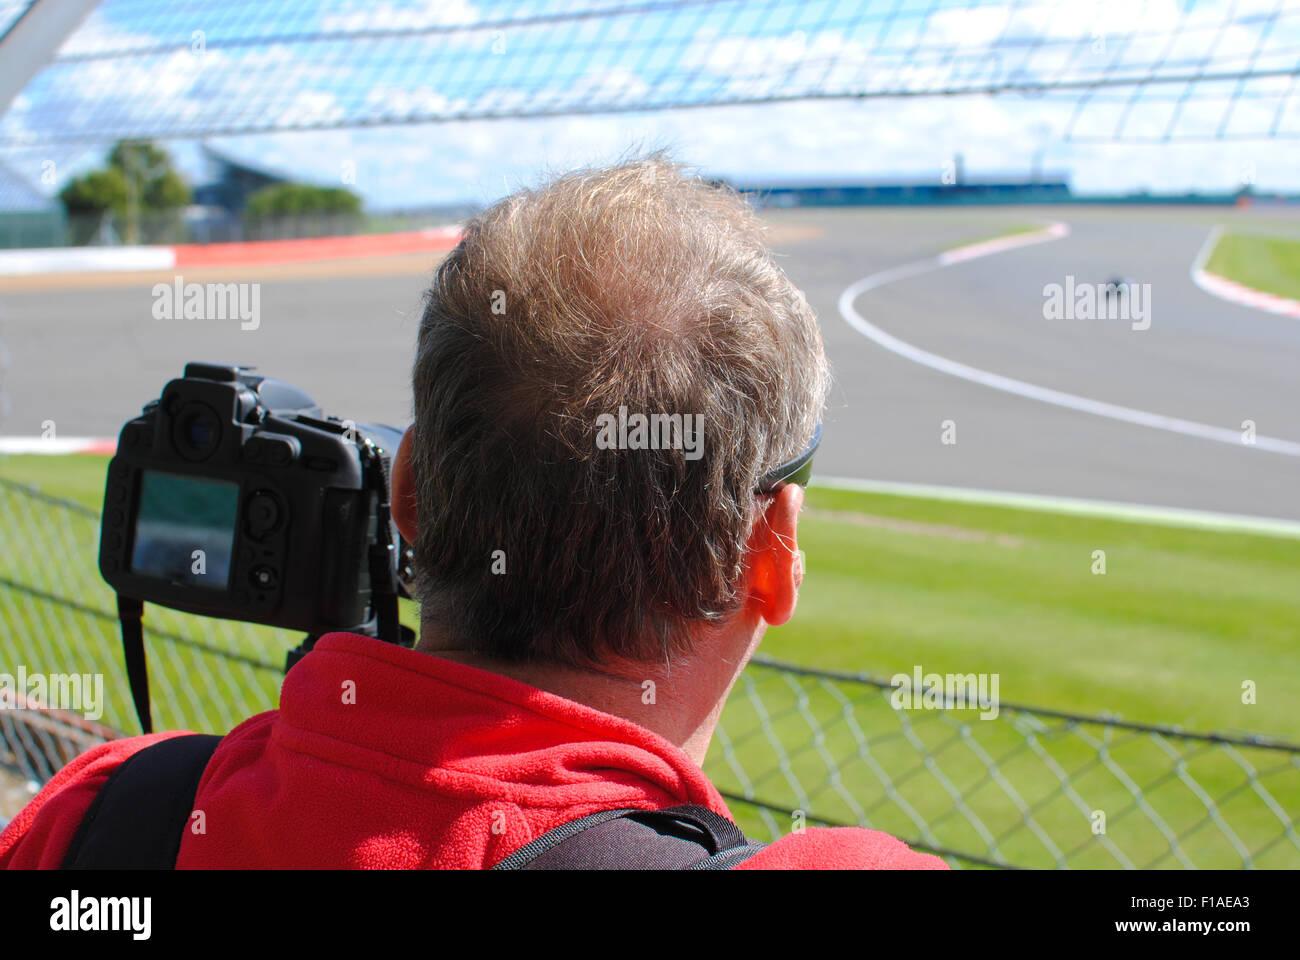 Motor racing Photographer - Stock Image